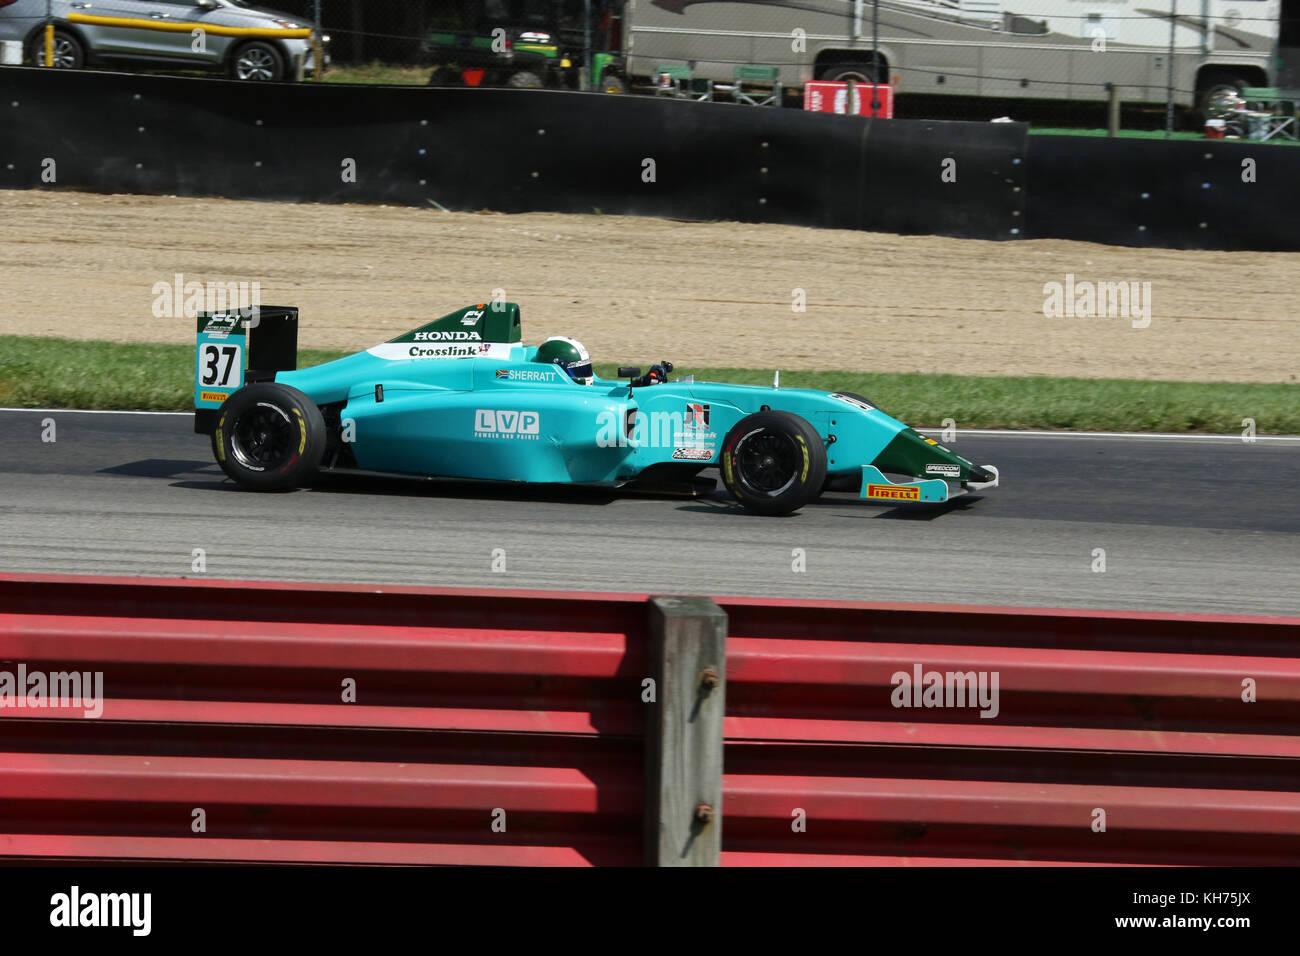 Jordan Sherratt. Car 37. Formula 4 Race. Mid-Ohio Sports Car Course. Lexington, Mansfield, Ohio, USA. - Stock Image